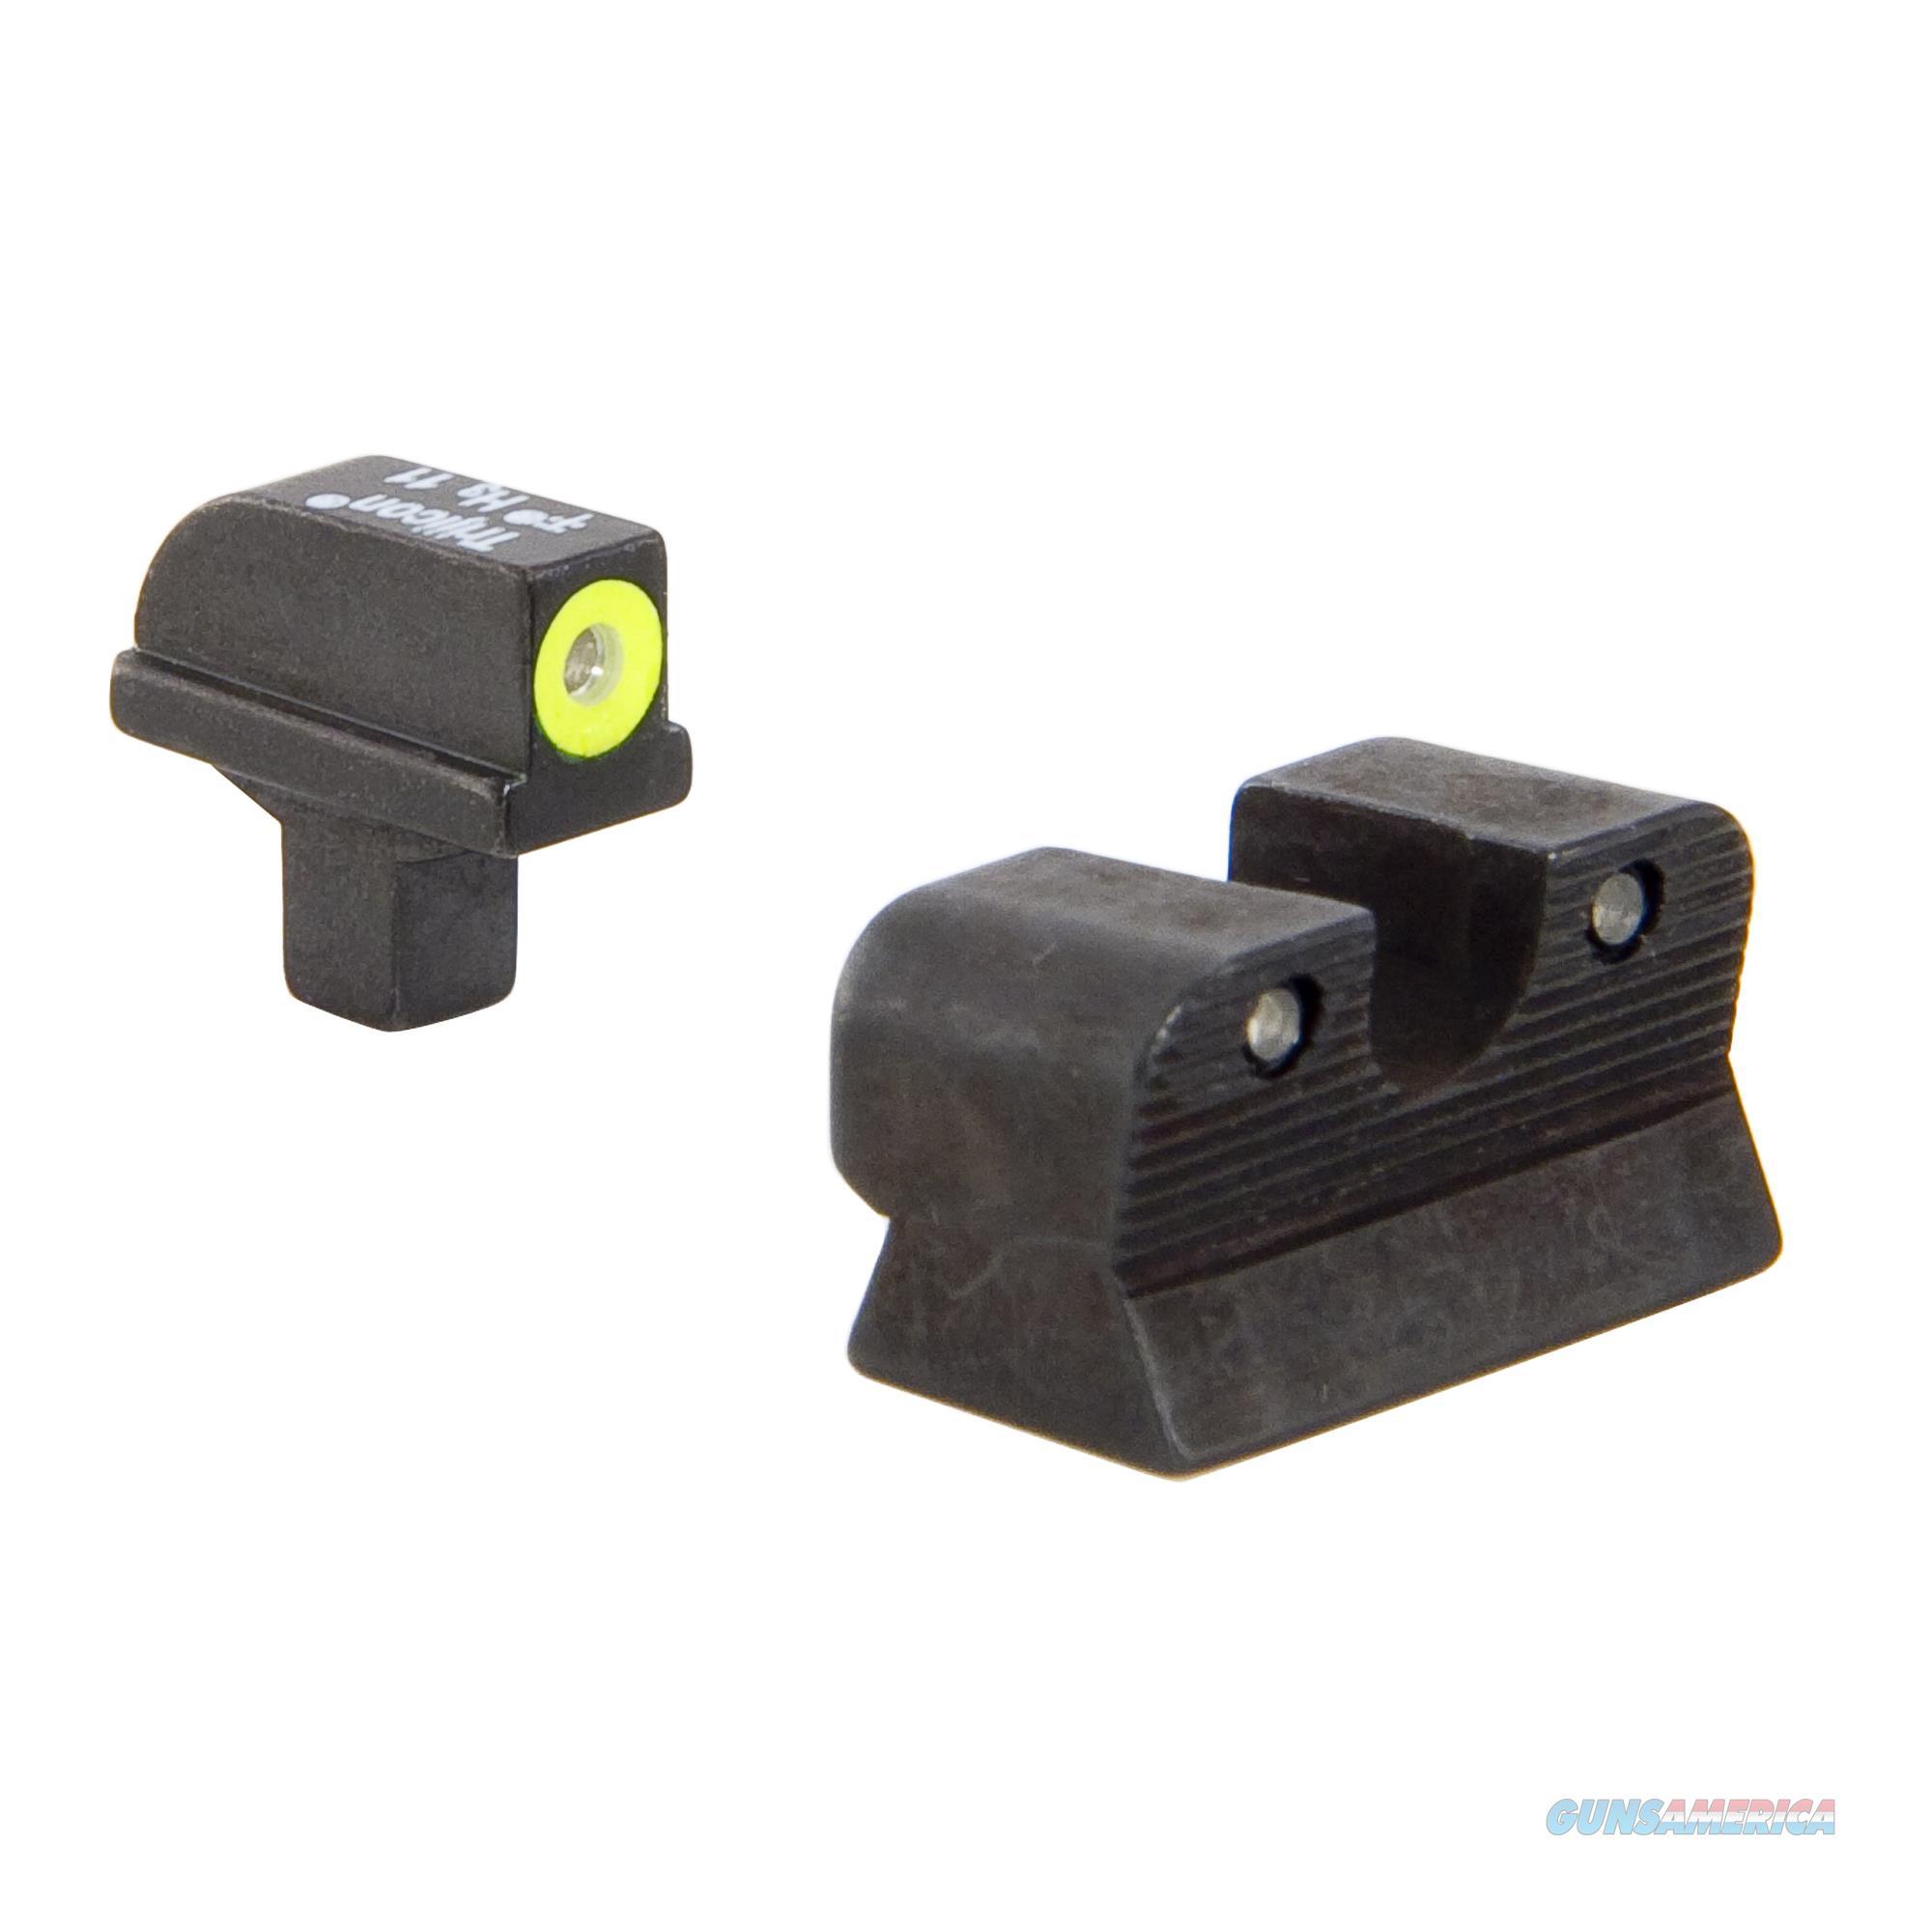 Trijicon Colt Hd Night Sight Set CA110-C-600816  Non-Guns > Iron/Metal/Peep Sights